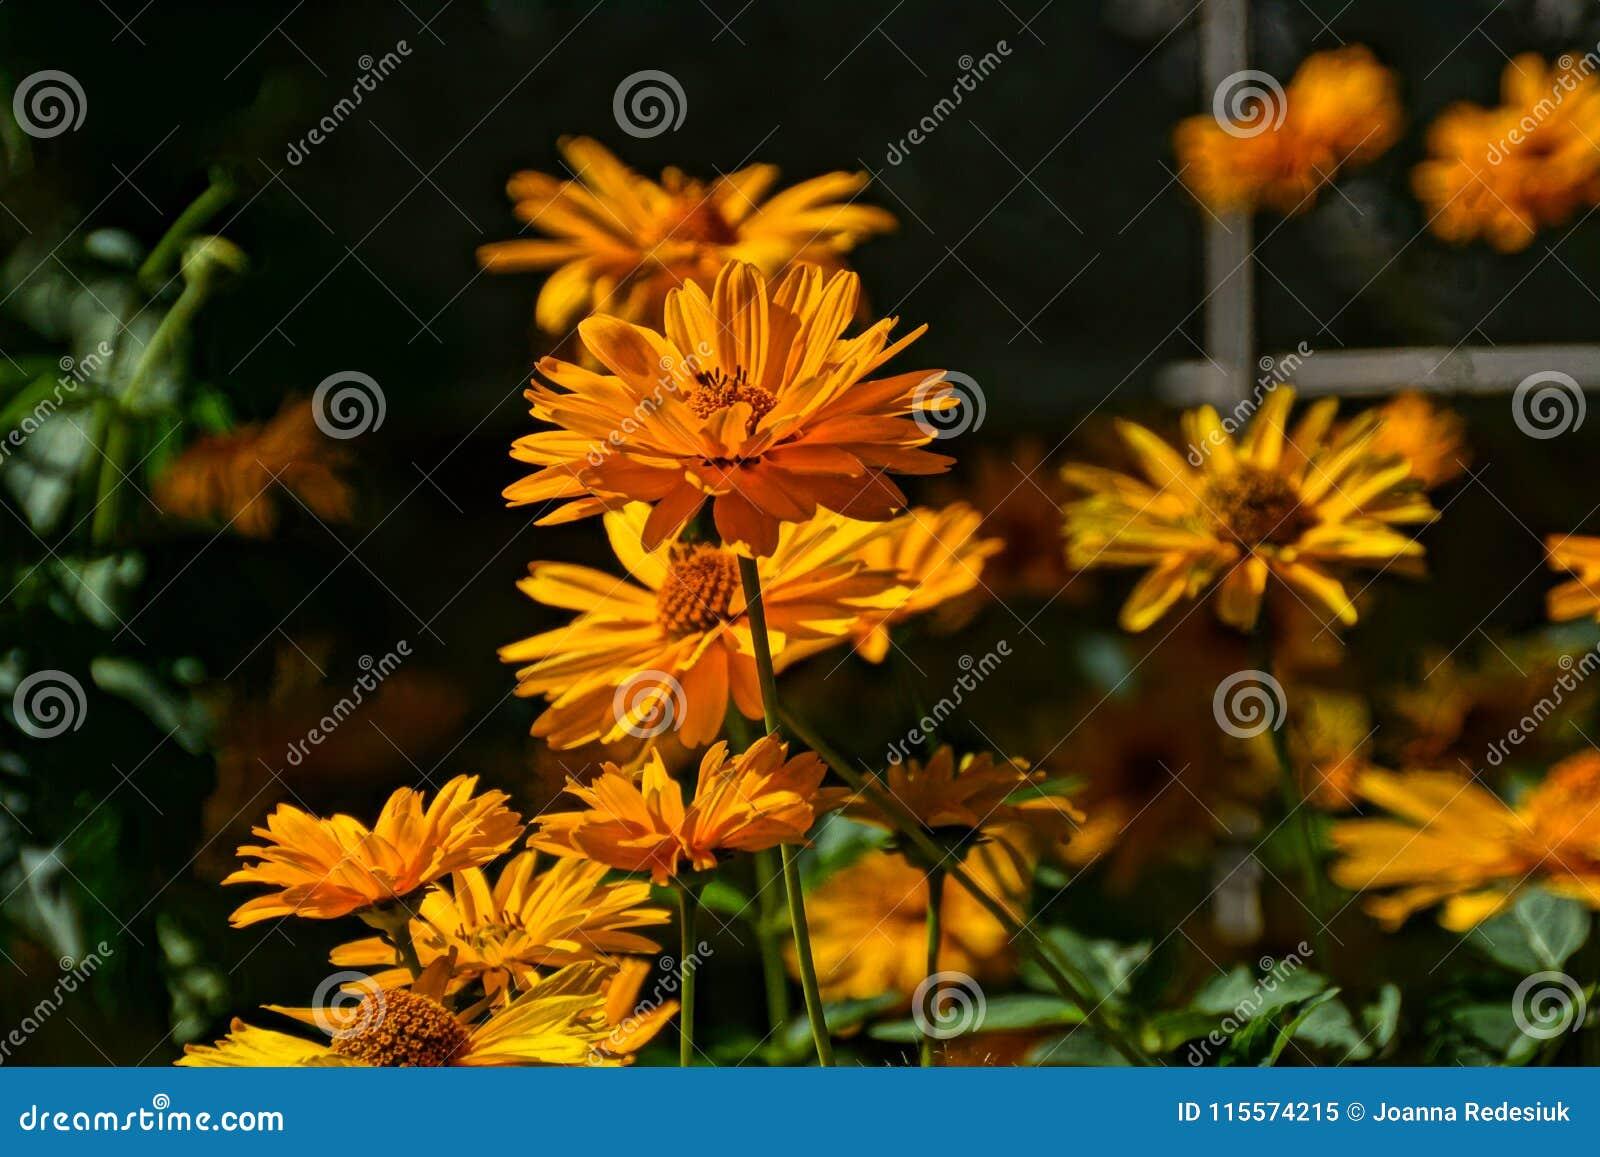 Dark yellow flowers growing in the garden in the warm summer af download dark yellow flowers growing in the garden in the warm summer af stock image mightylinksfo